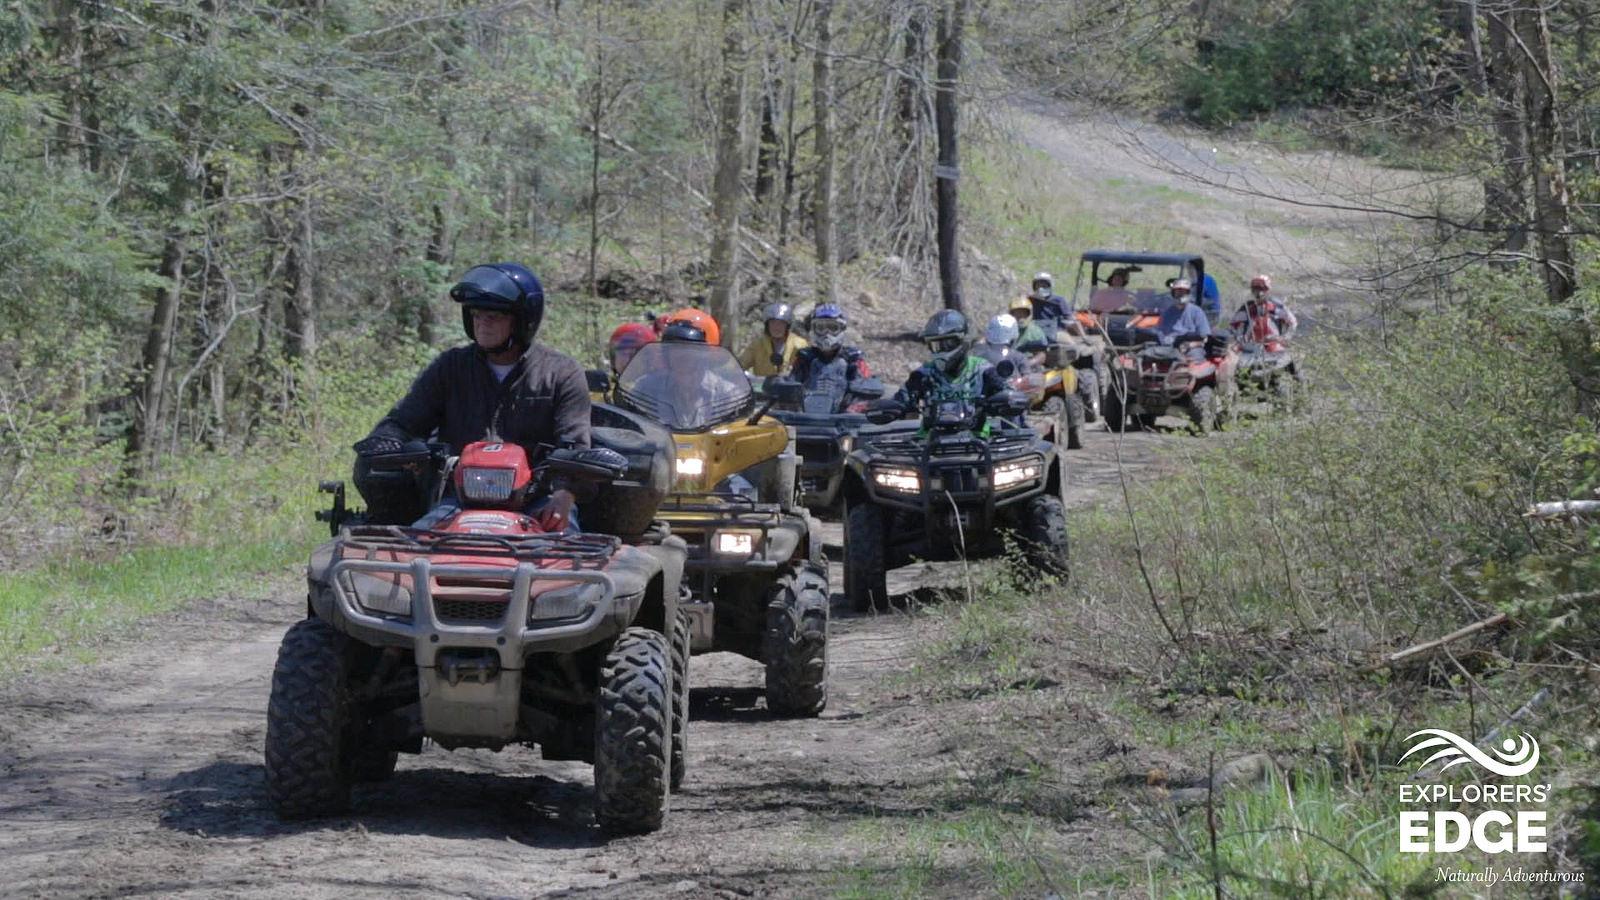 Atv Adventures Four Wheeling Fun Explorers Edge